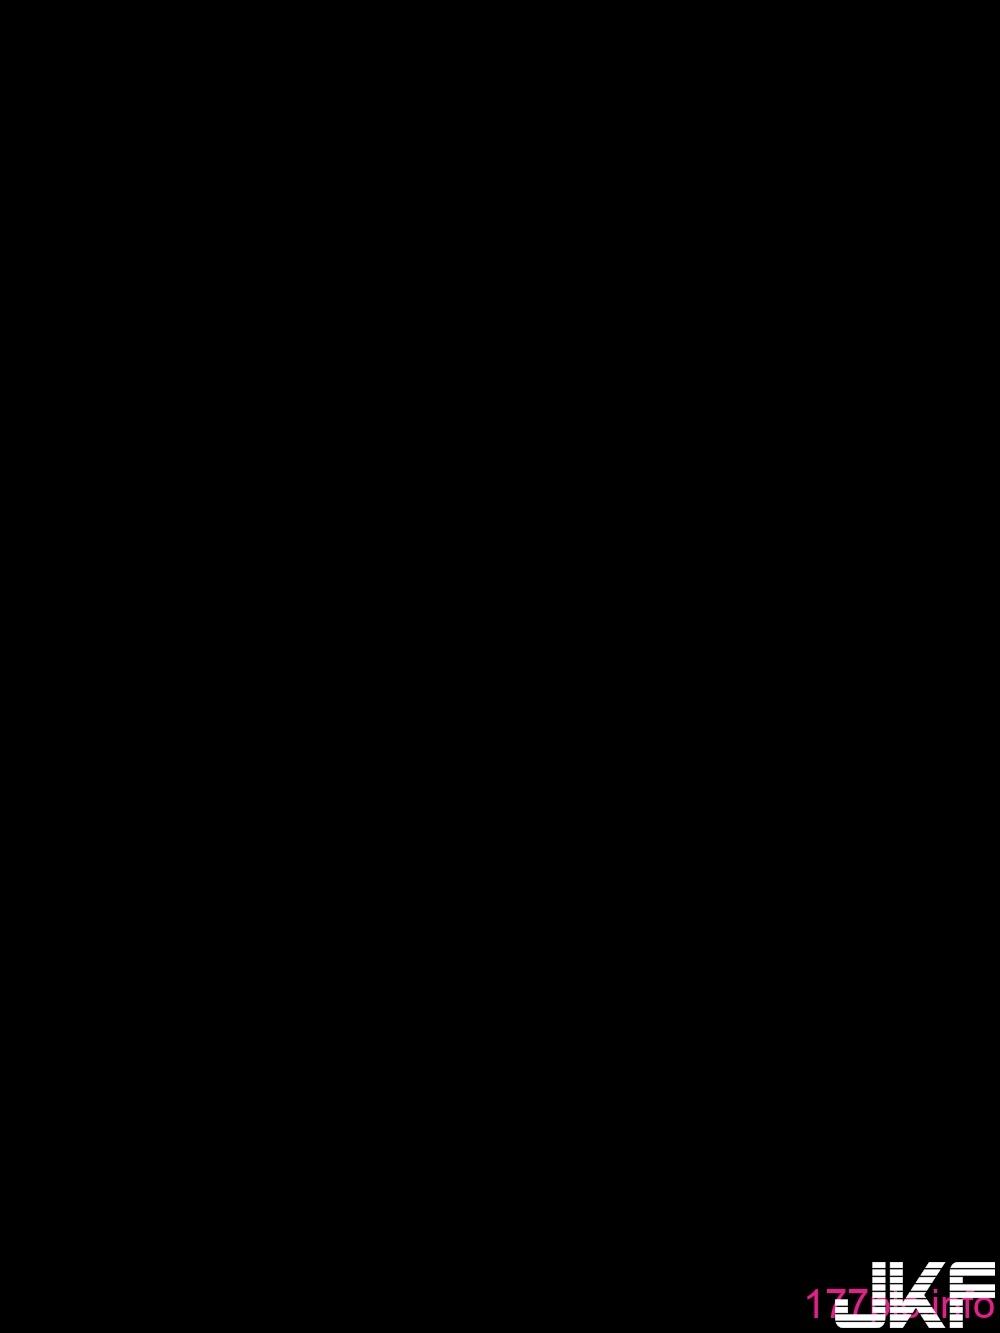 a0011-87.jpg